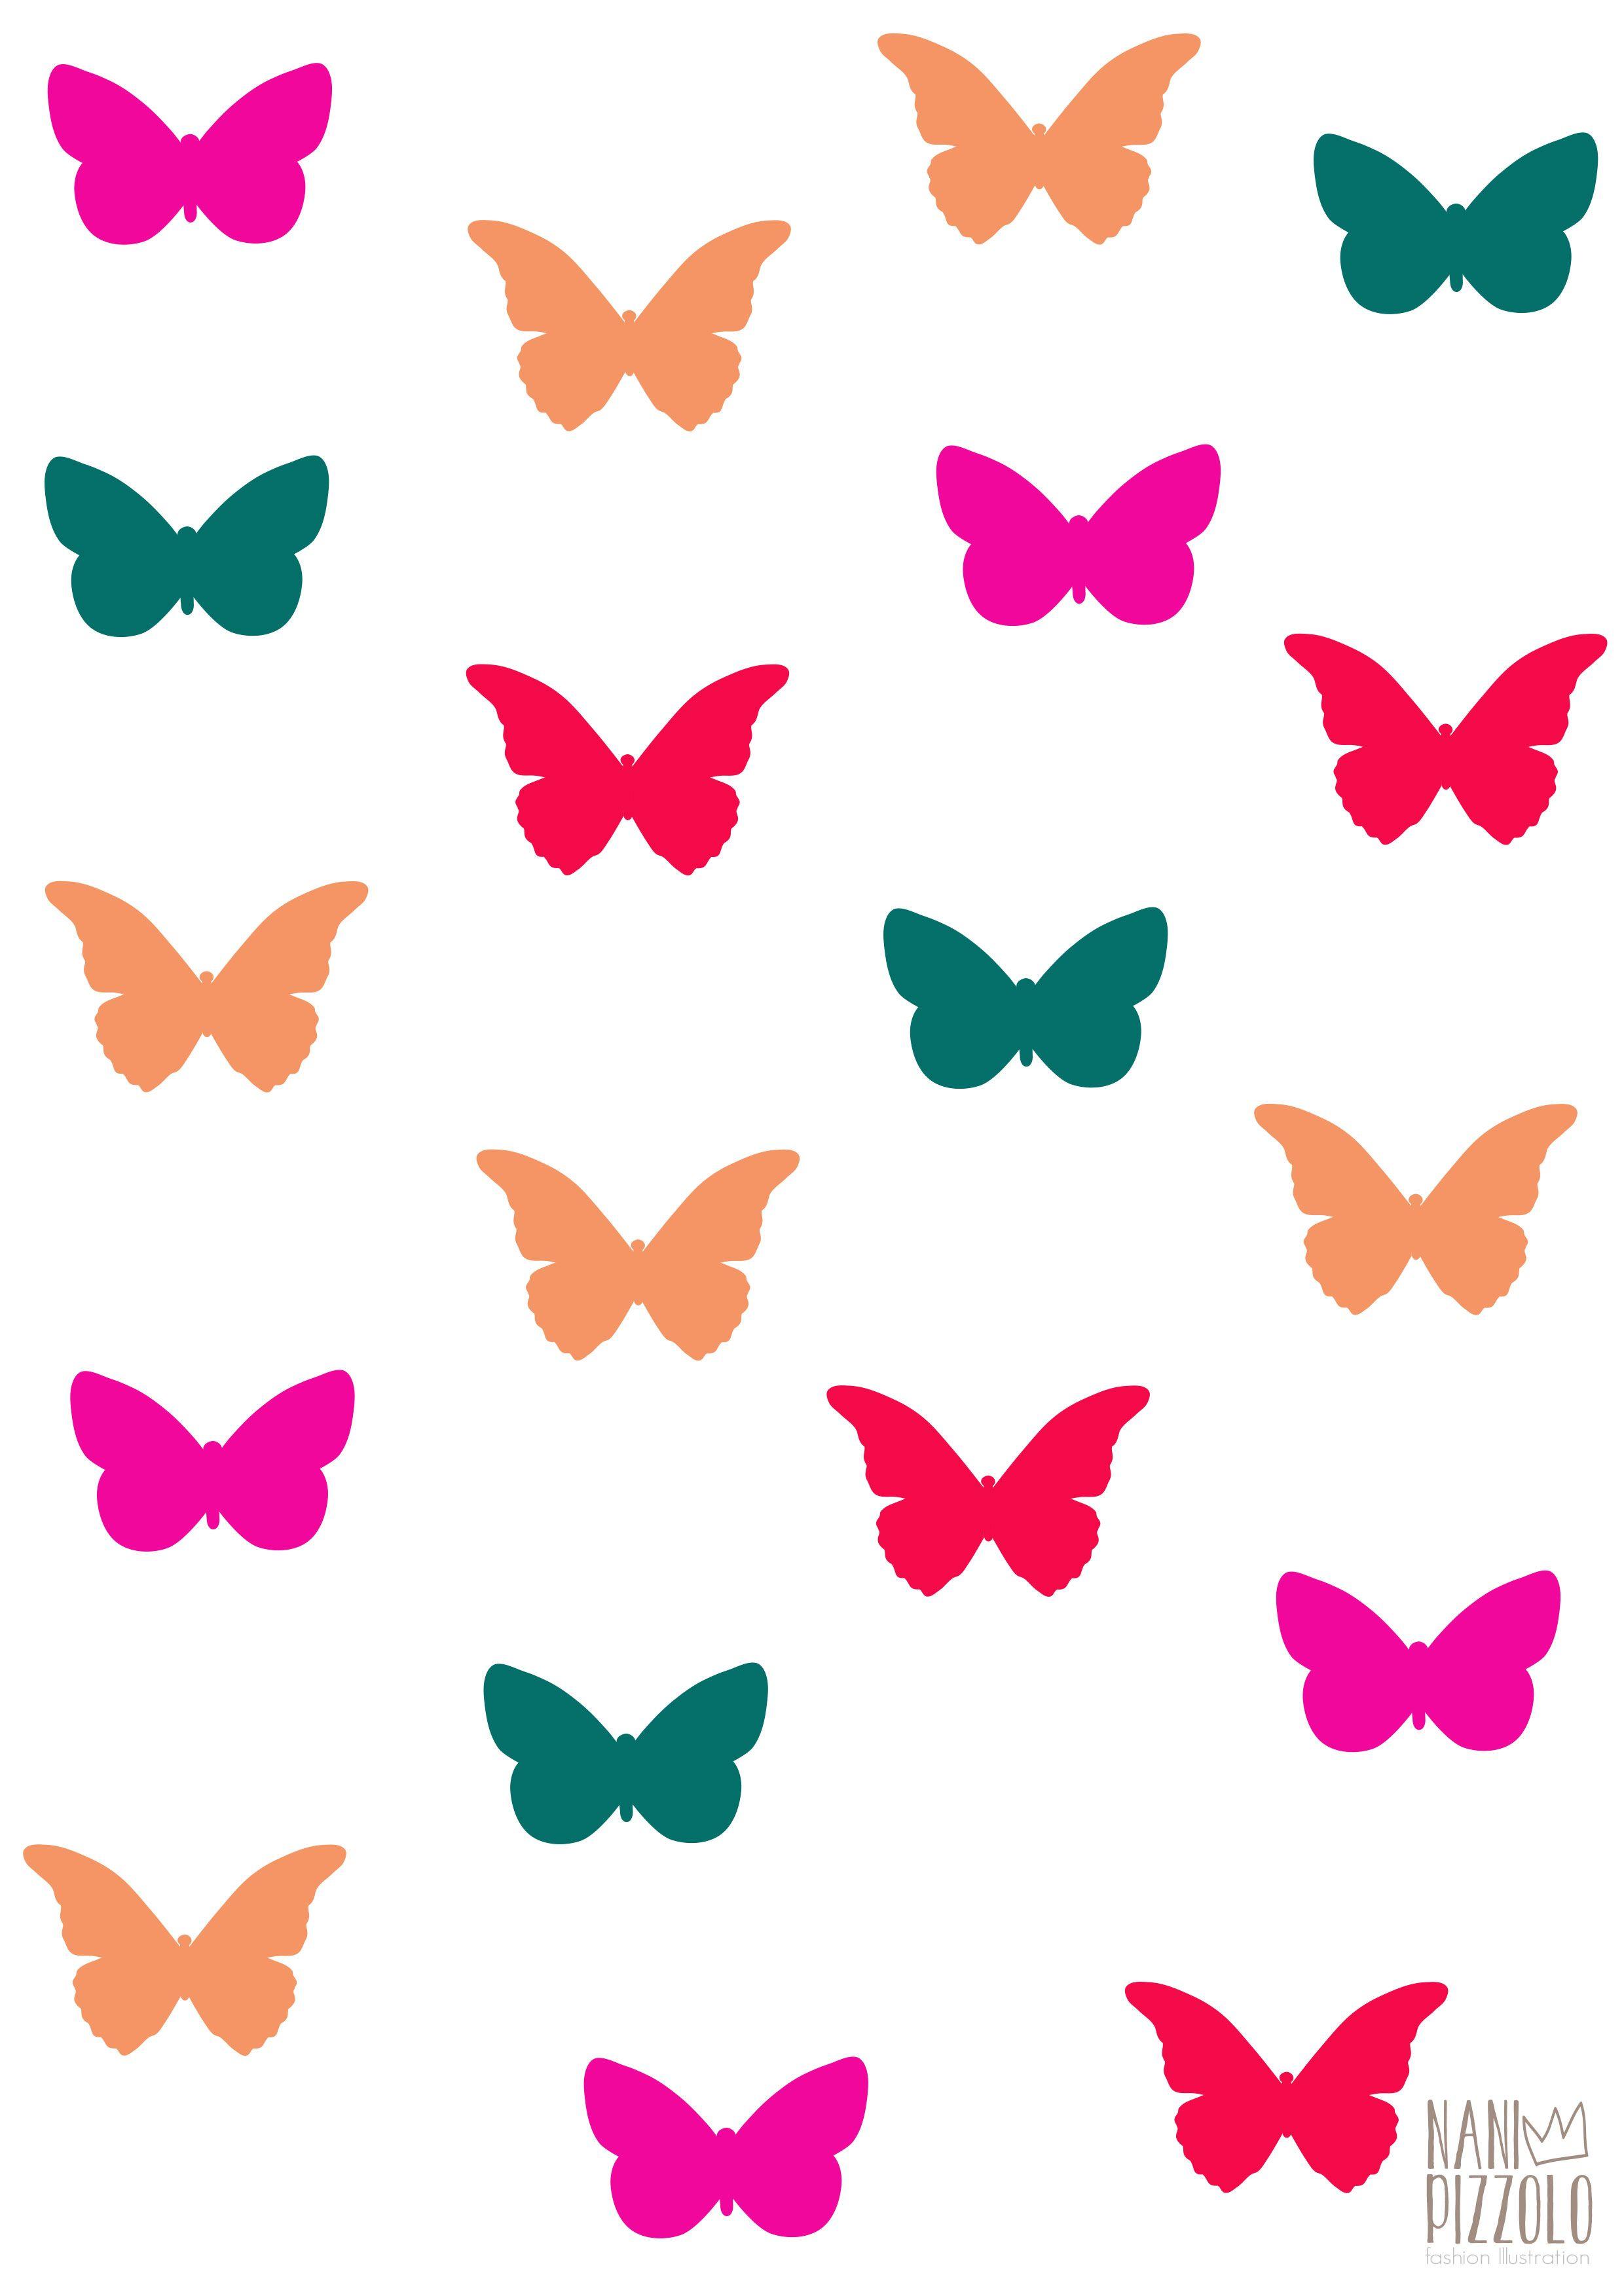 #desenhodemoda #drawing #illustration #fashiondesign #fashionillustration #spring #print #printed #butterfly #borboleta #mariposa #estampado #estampa @Nani Pizzolo